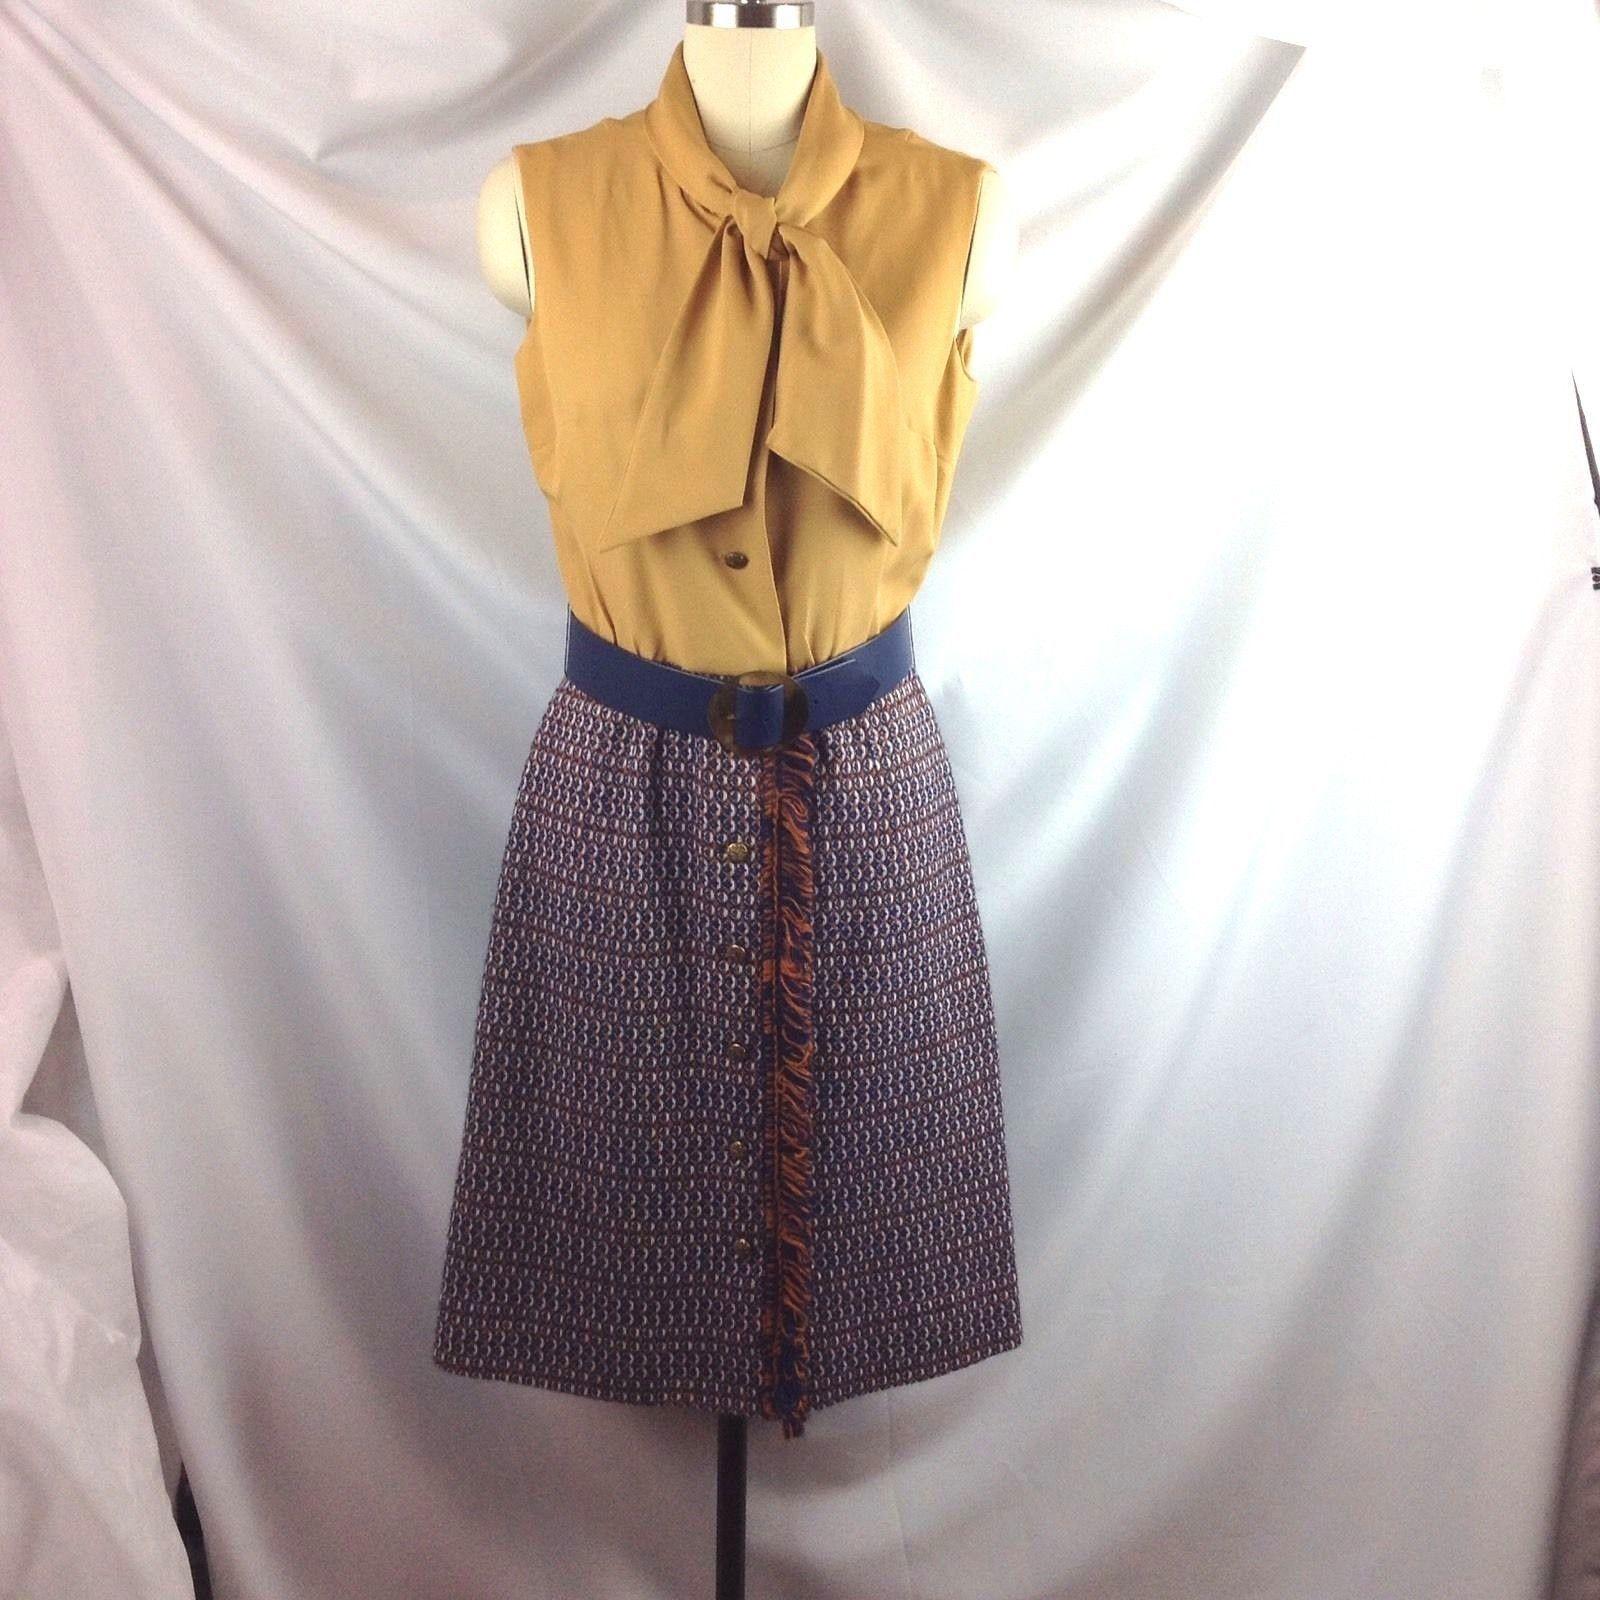 Vtg Fringe Trim Coordinates Dress Outfit Jacket Suit Pussy Bow Navy Gold Orange